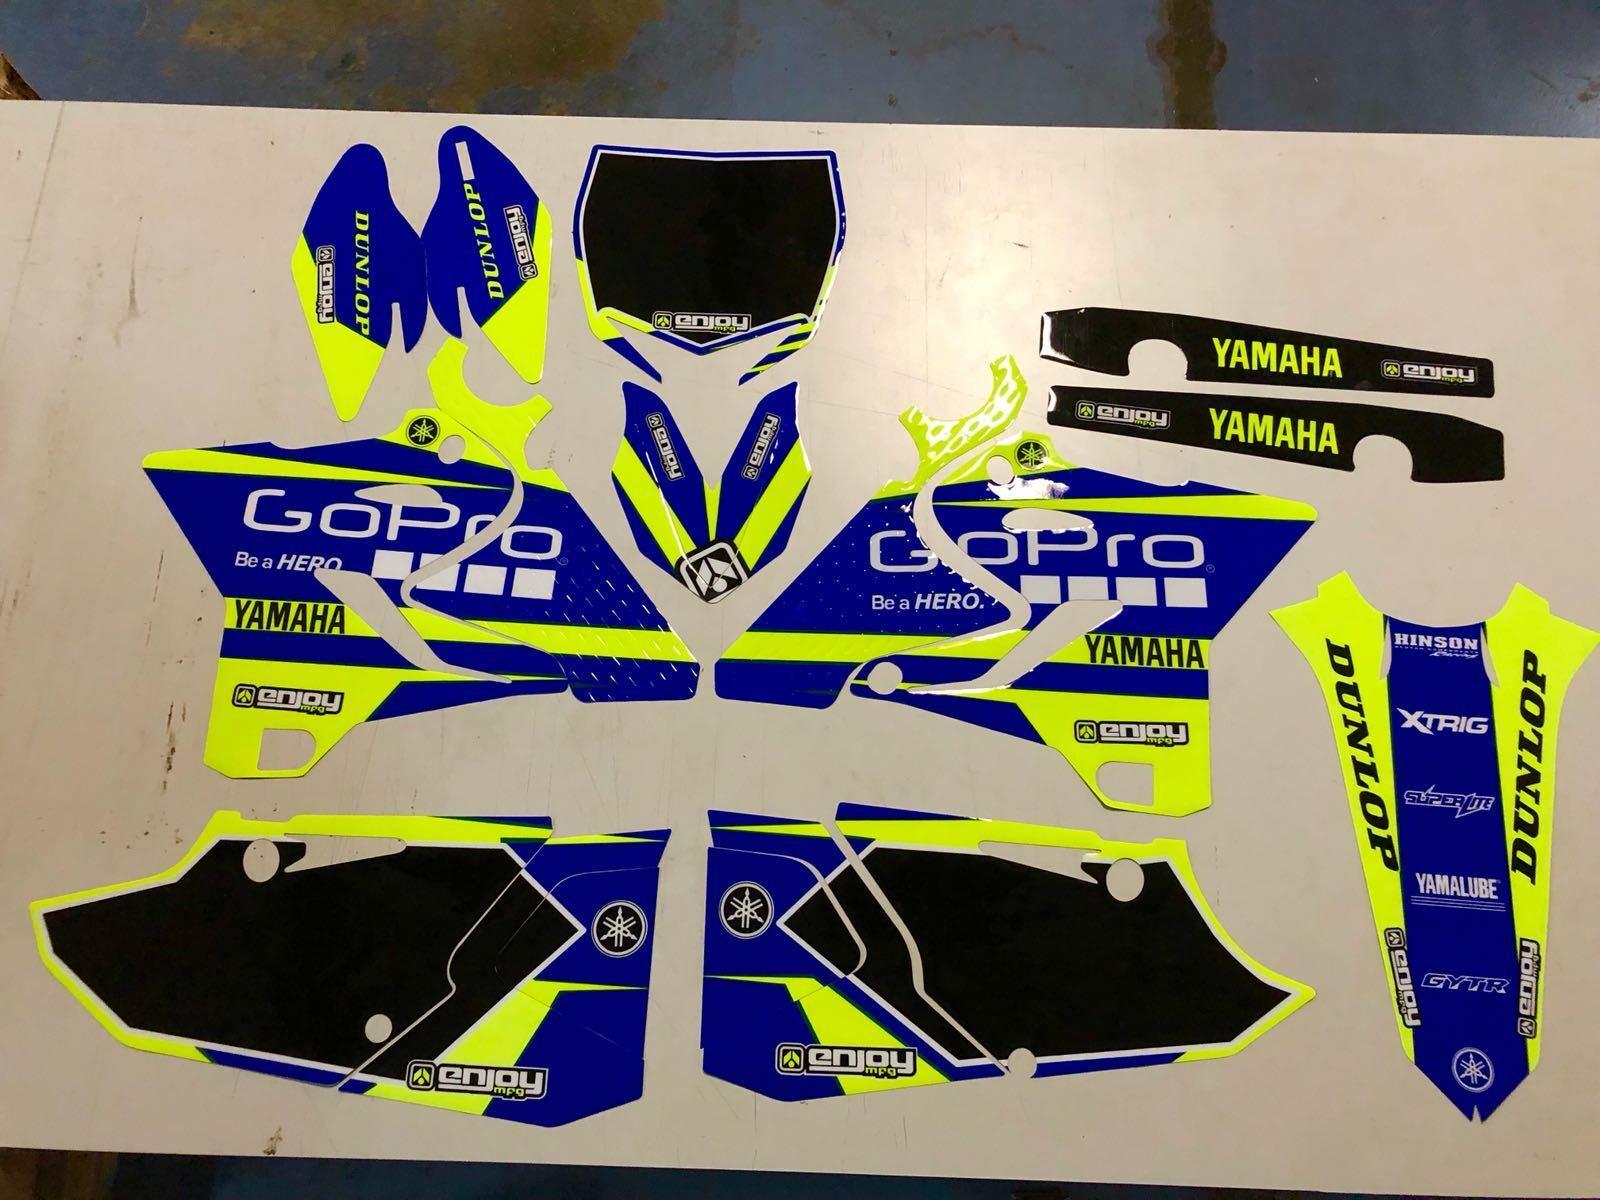 Enjoy MFG 2002-2019 Yamaha YZ 125 YZ 250 BLUE SIDES BLUE RIBS Seat Cover NEON YELLOW TOP